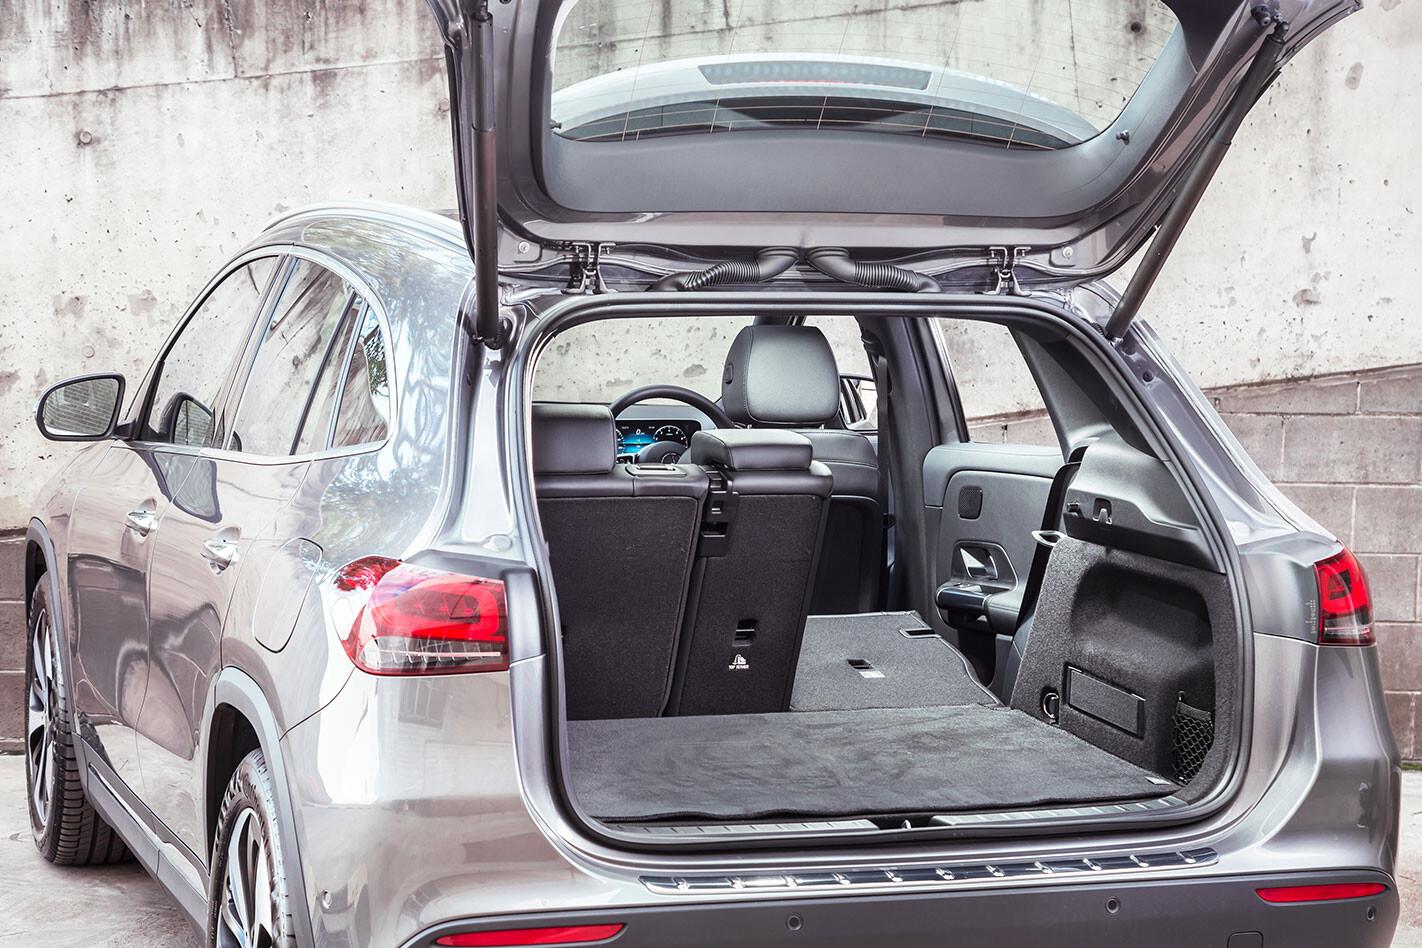 Mercedes-Benz GLA boot